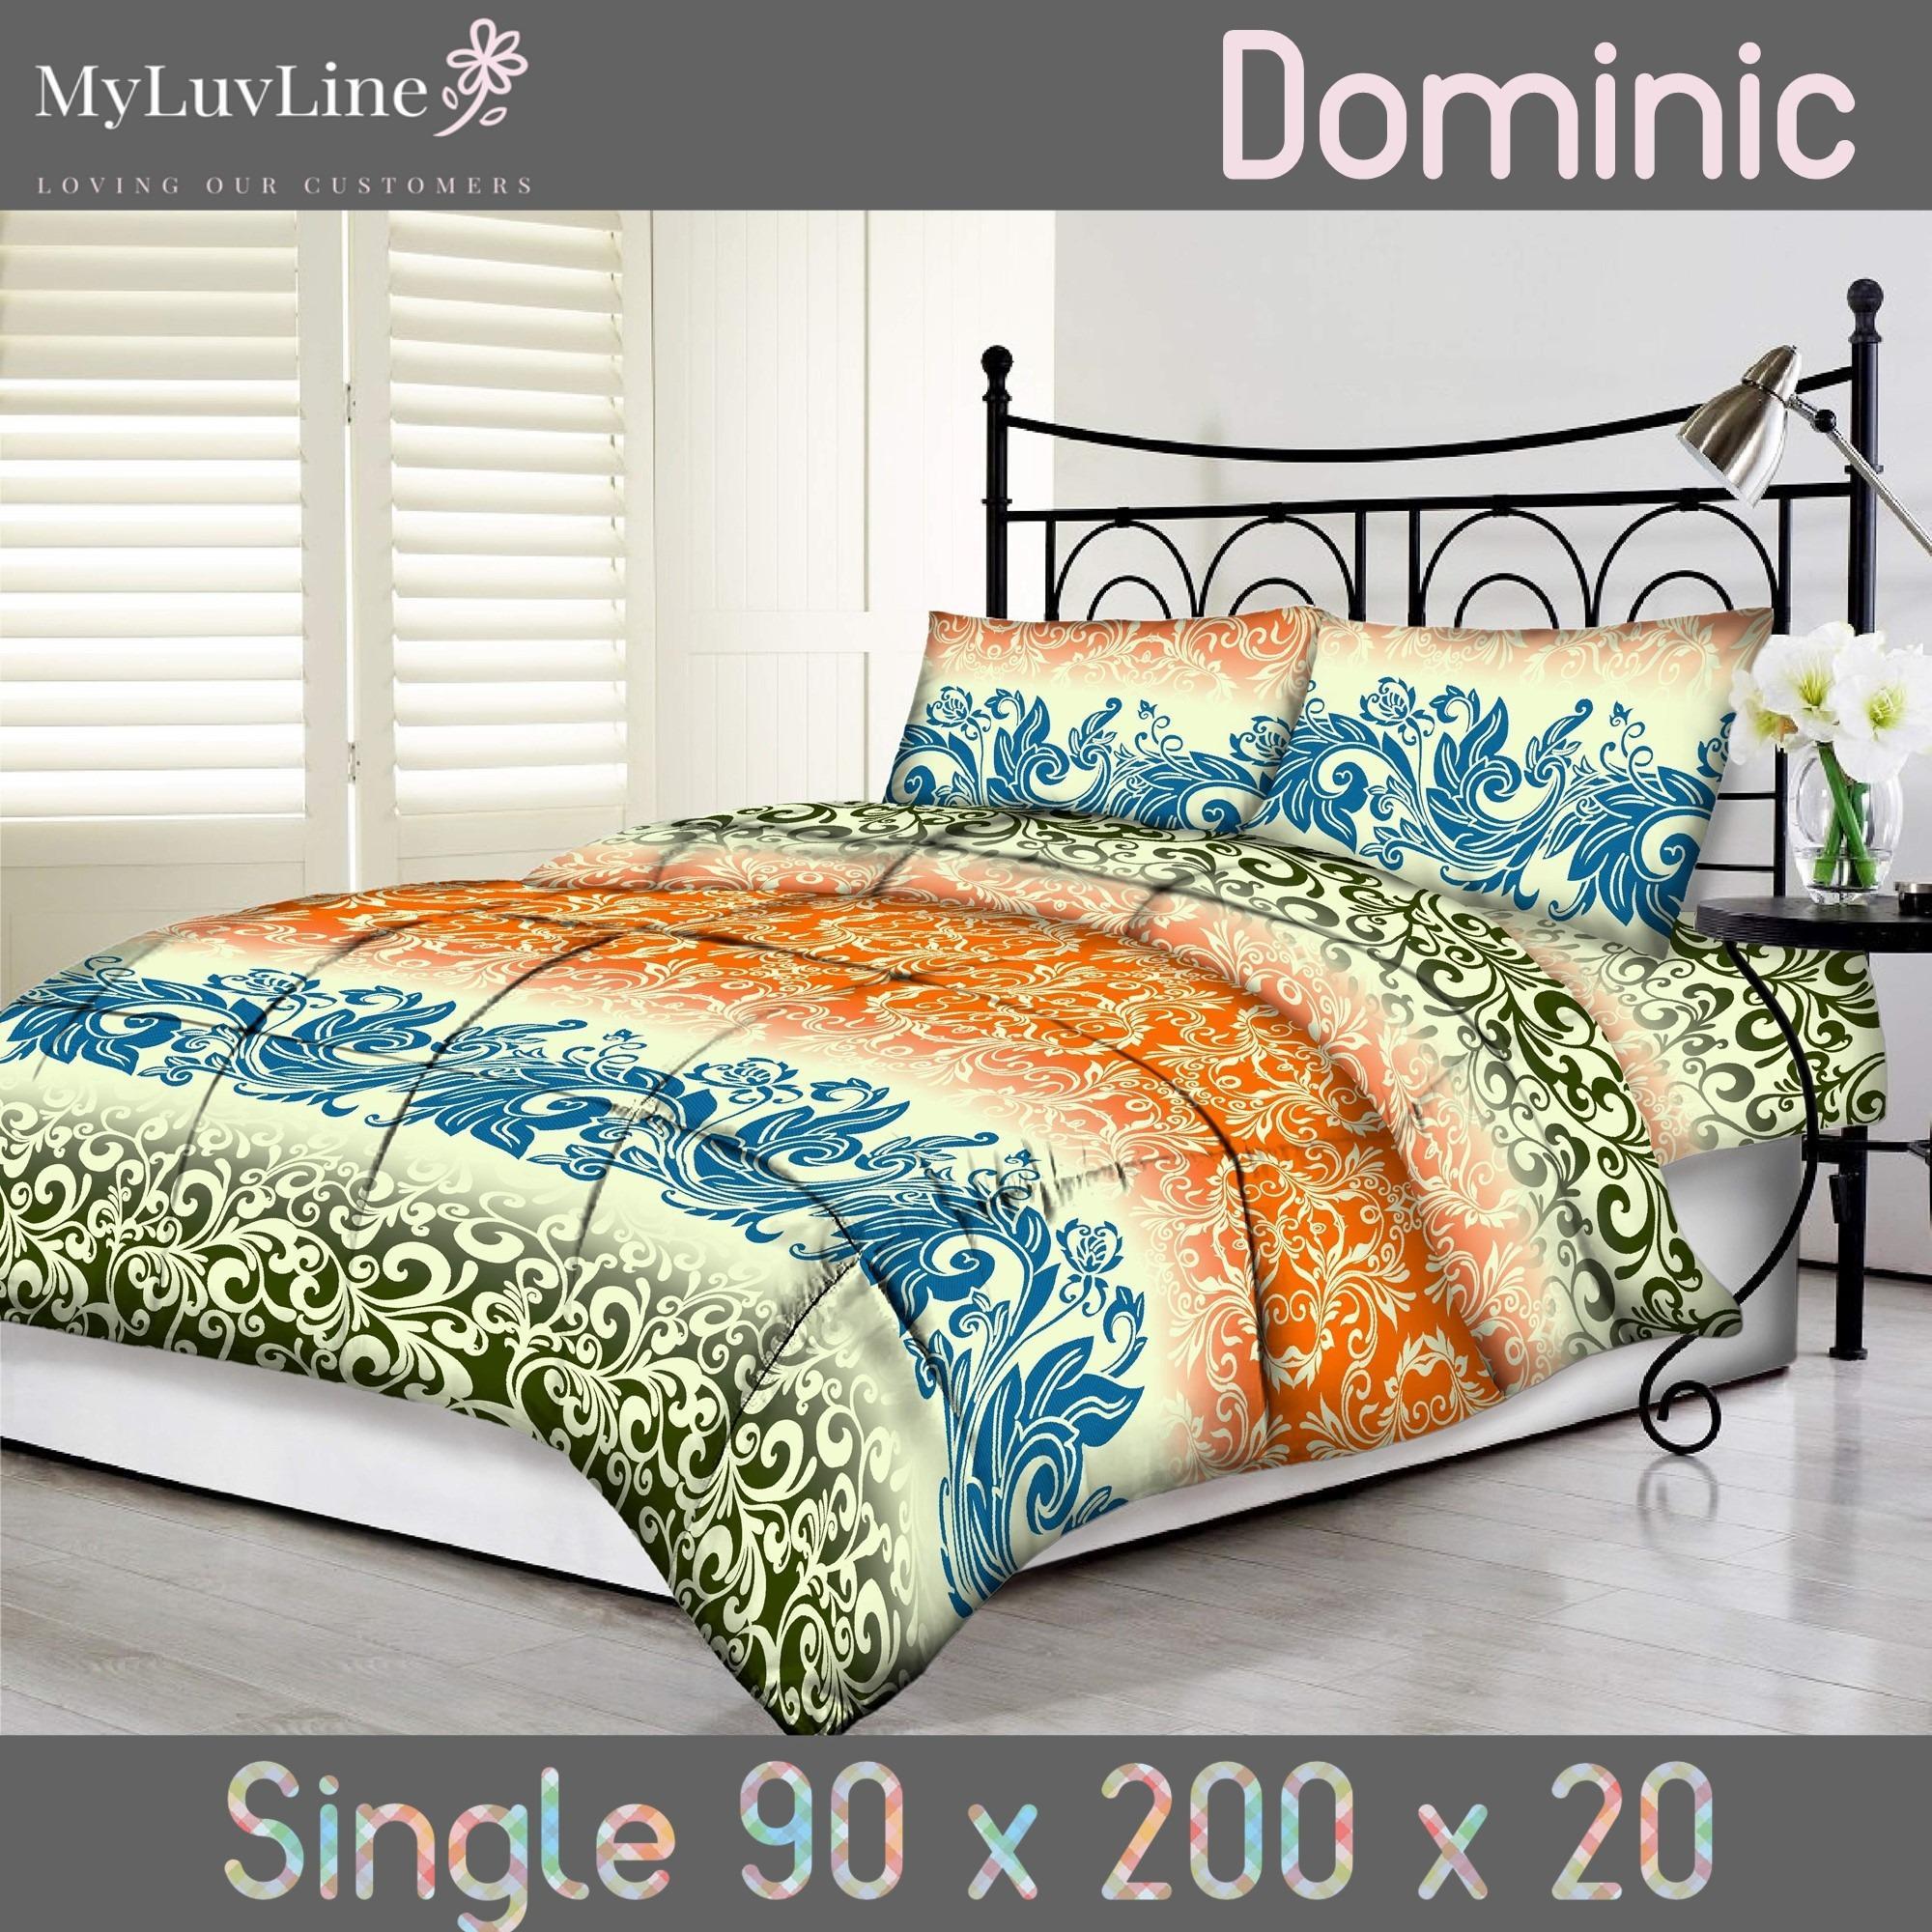 Beli Tommony Sprei Size 90 S D 180 Dominic Cicilan